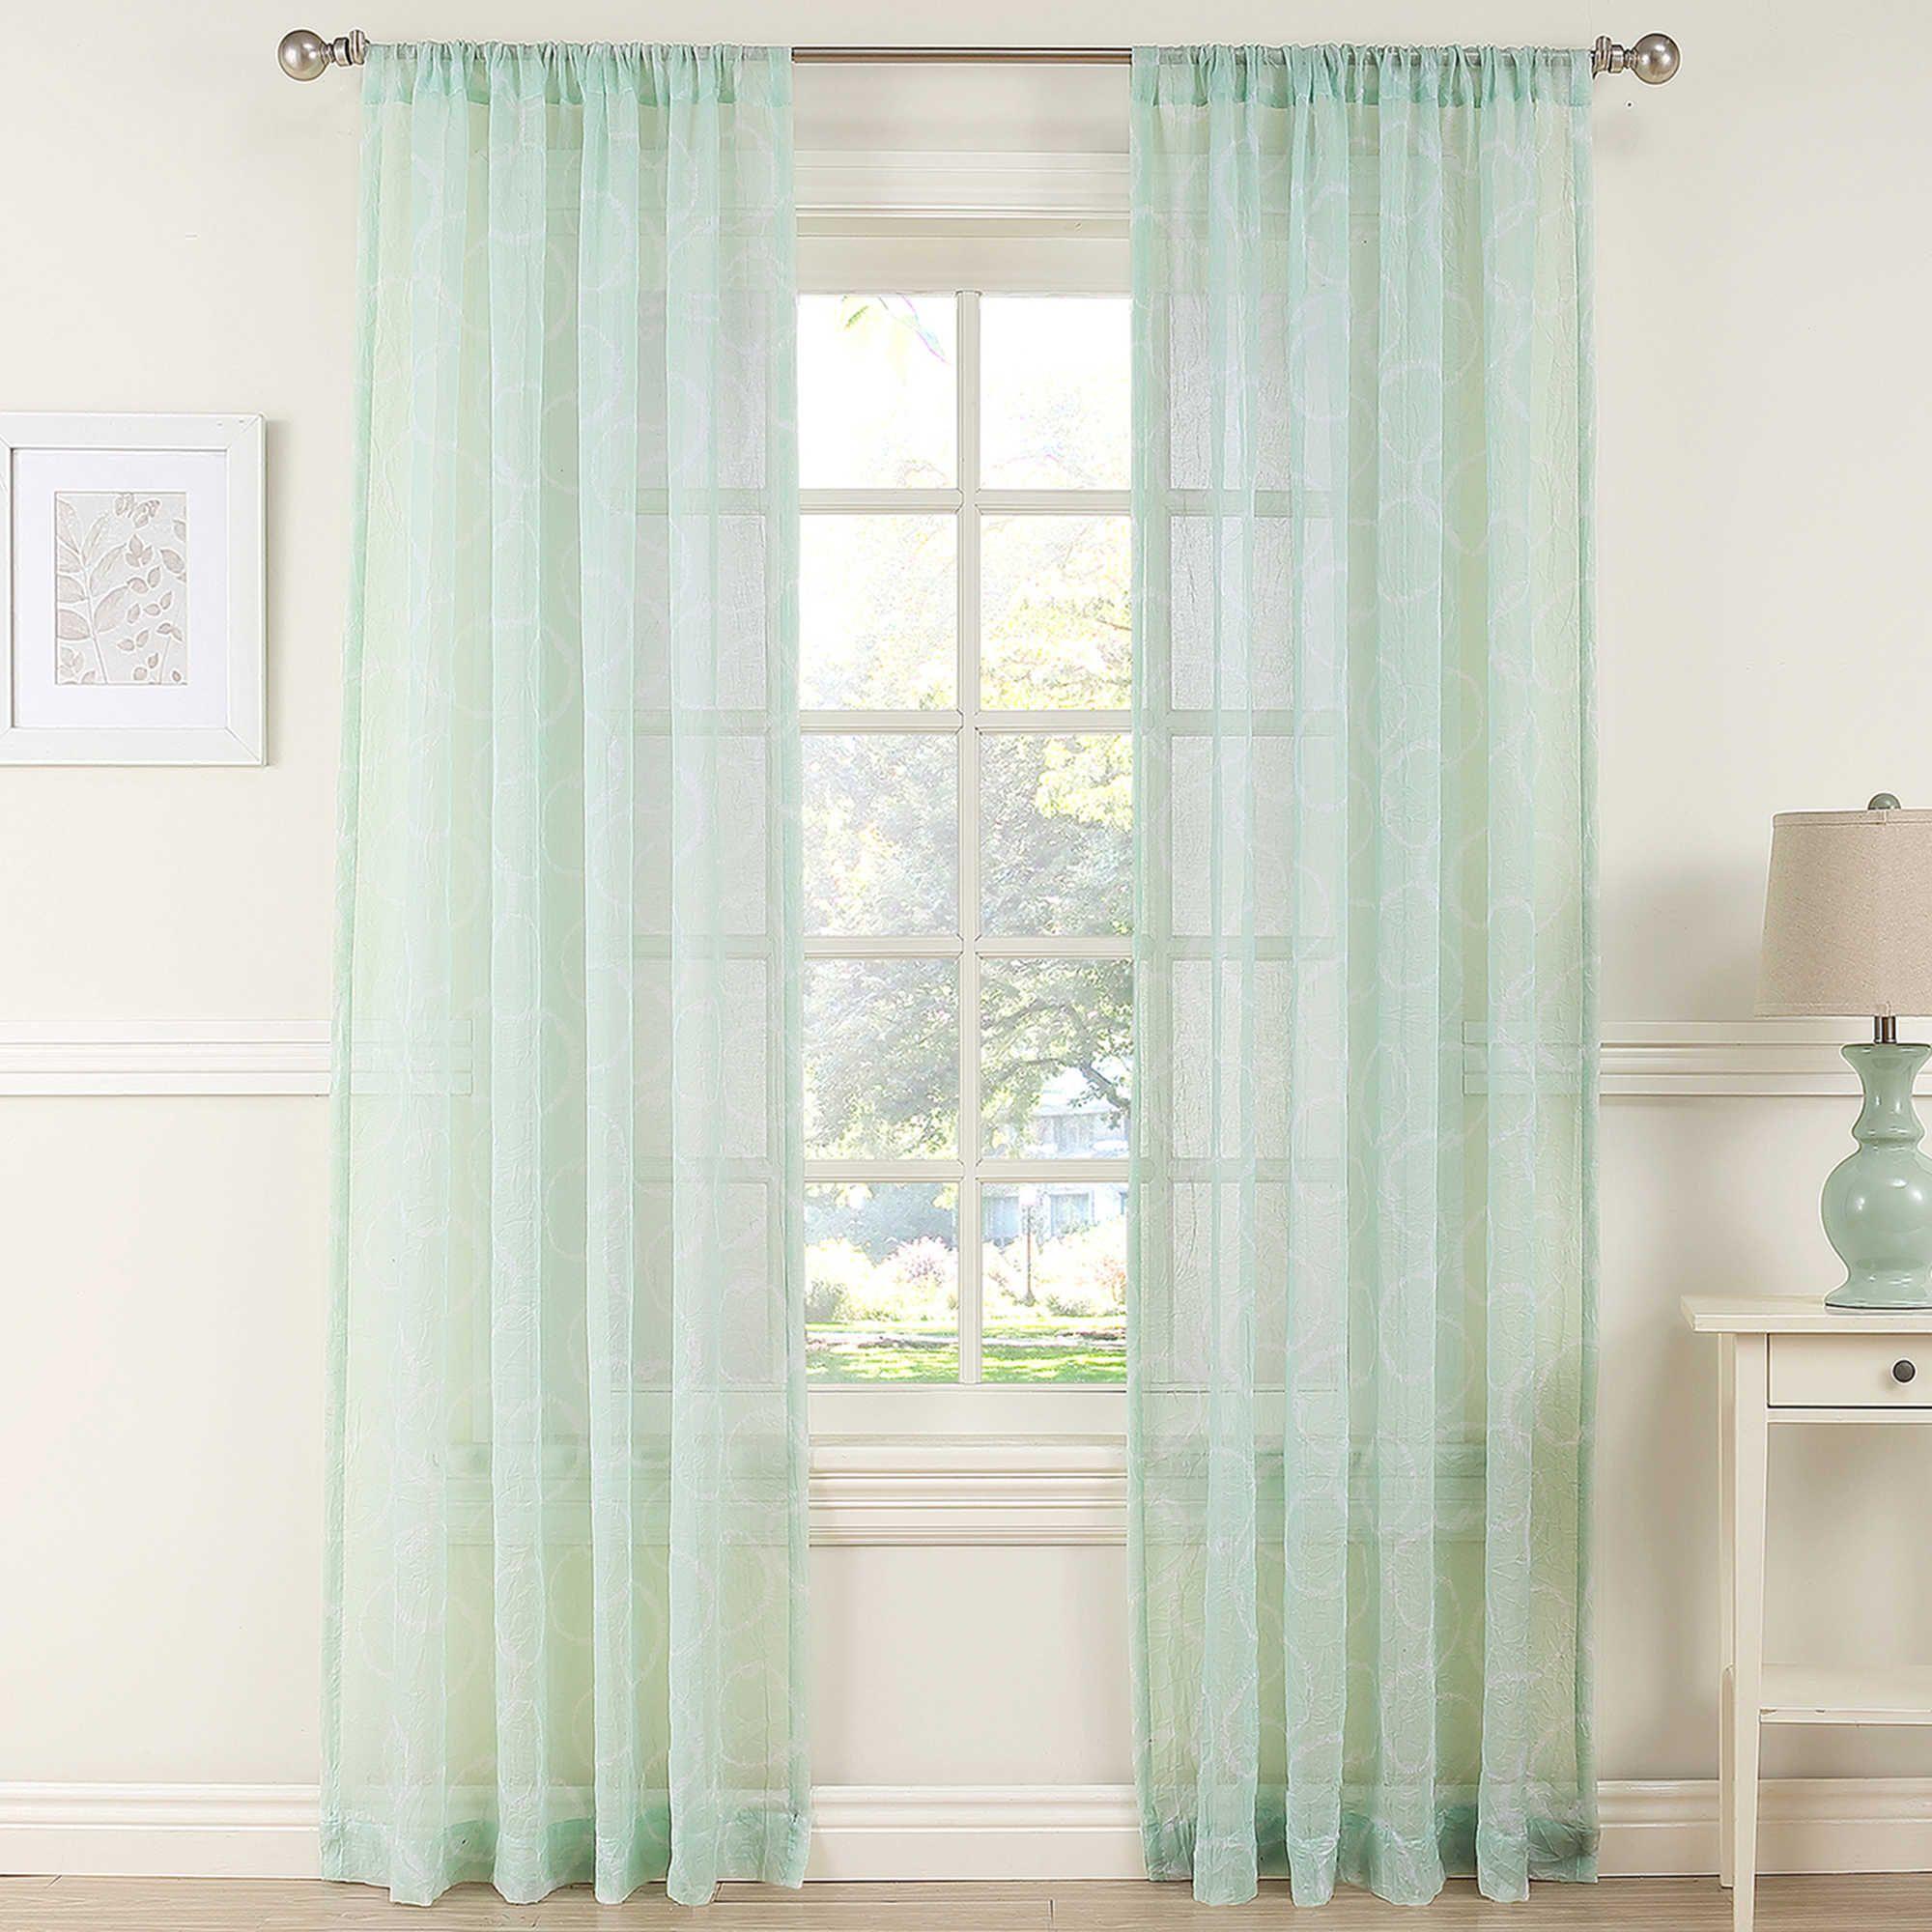 Daydreamer Sheer Window Curtain Panel In Mint Green Sheer